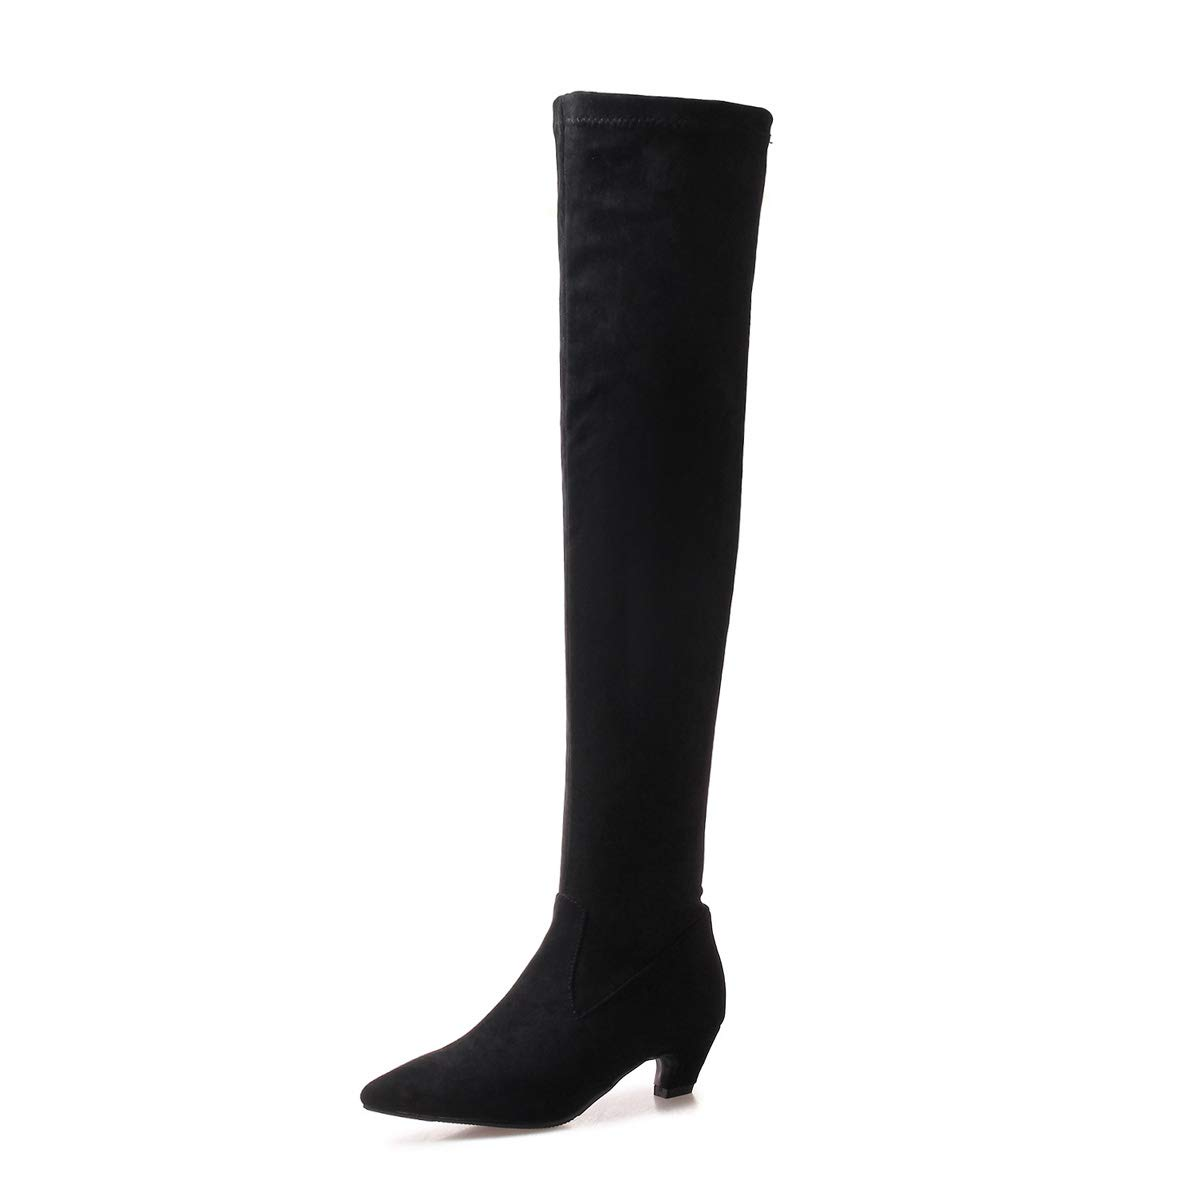 DANDANJIE Damen Herbst Overknee Stiefel Herbst Damen Winter Langlaufritter Stiefel für Damen Daily Night Party Club ef0ee5